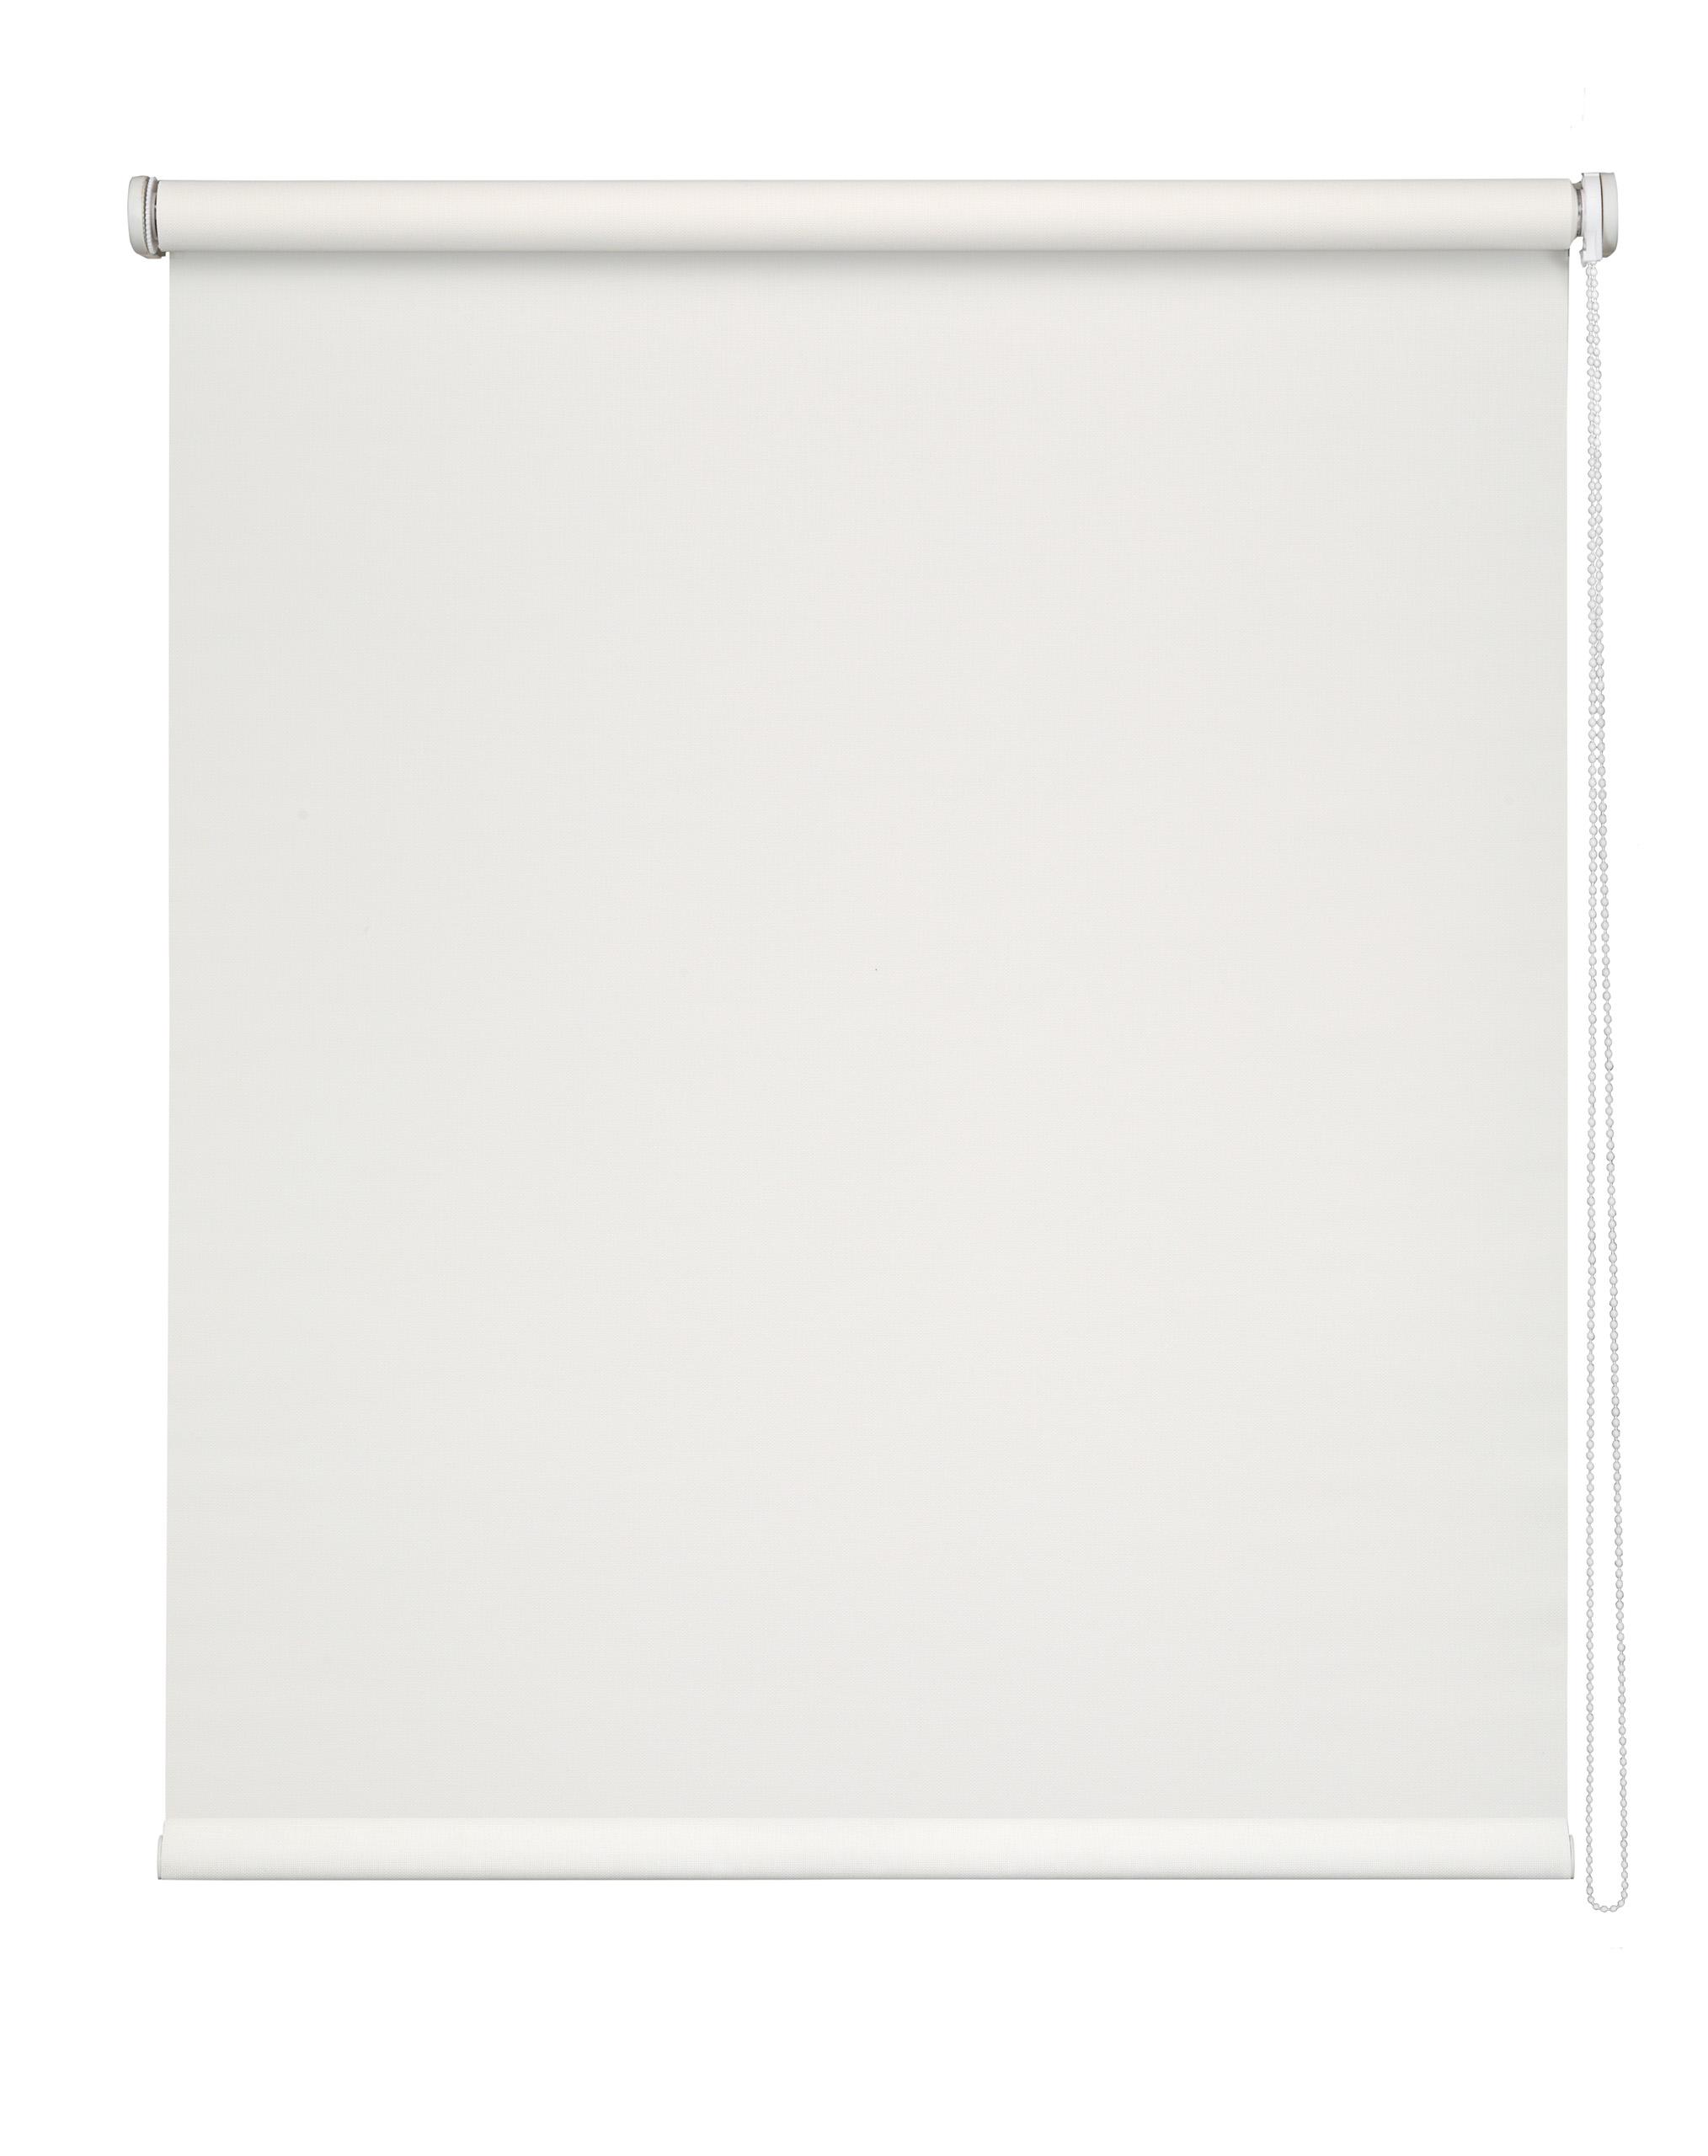 Store Enrouleur voile Screen - Blanc - 105 x 250 cm